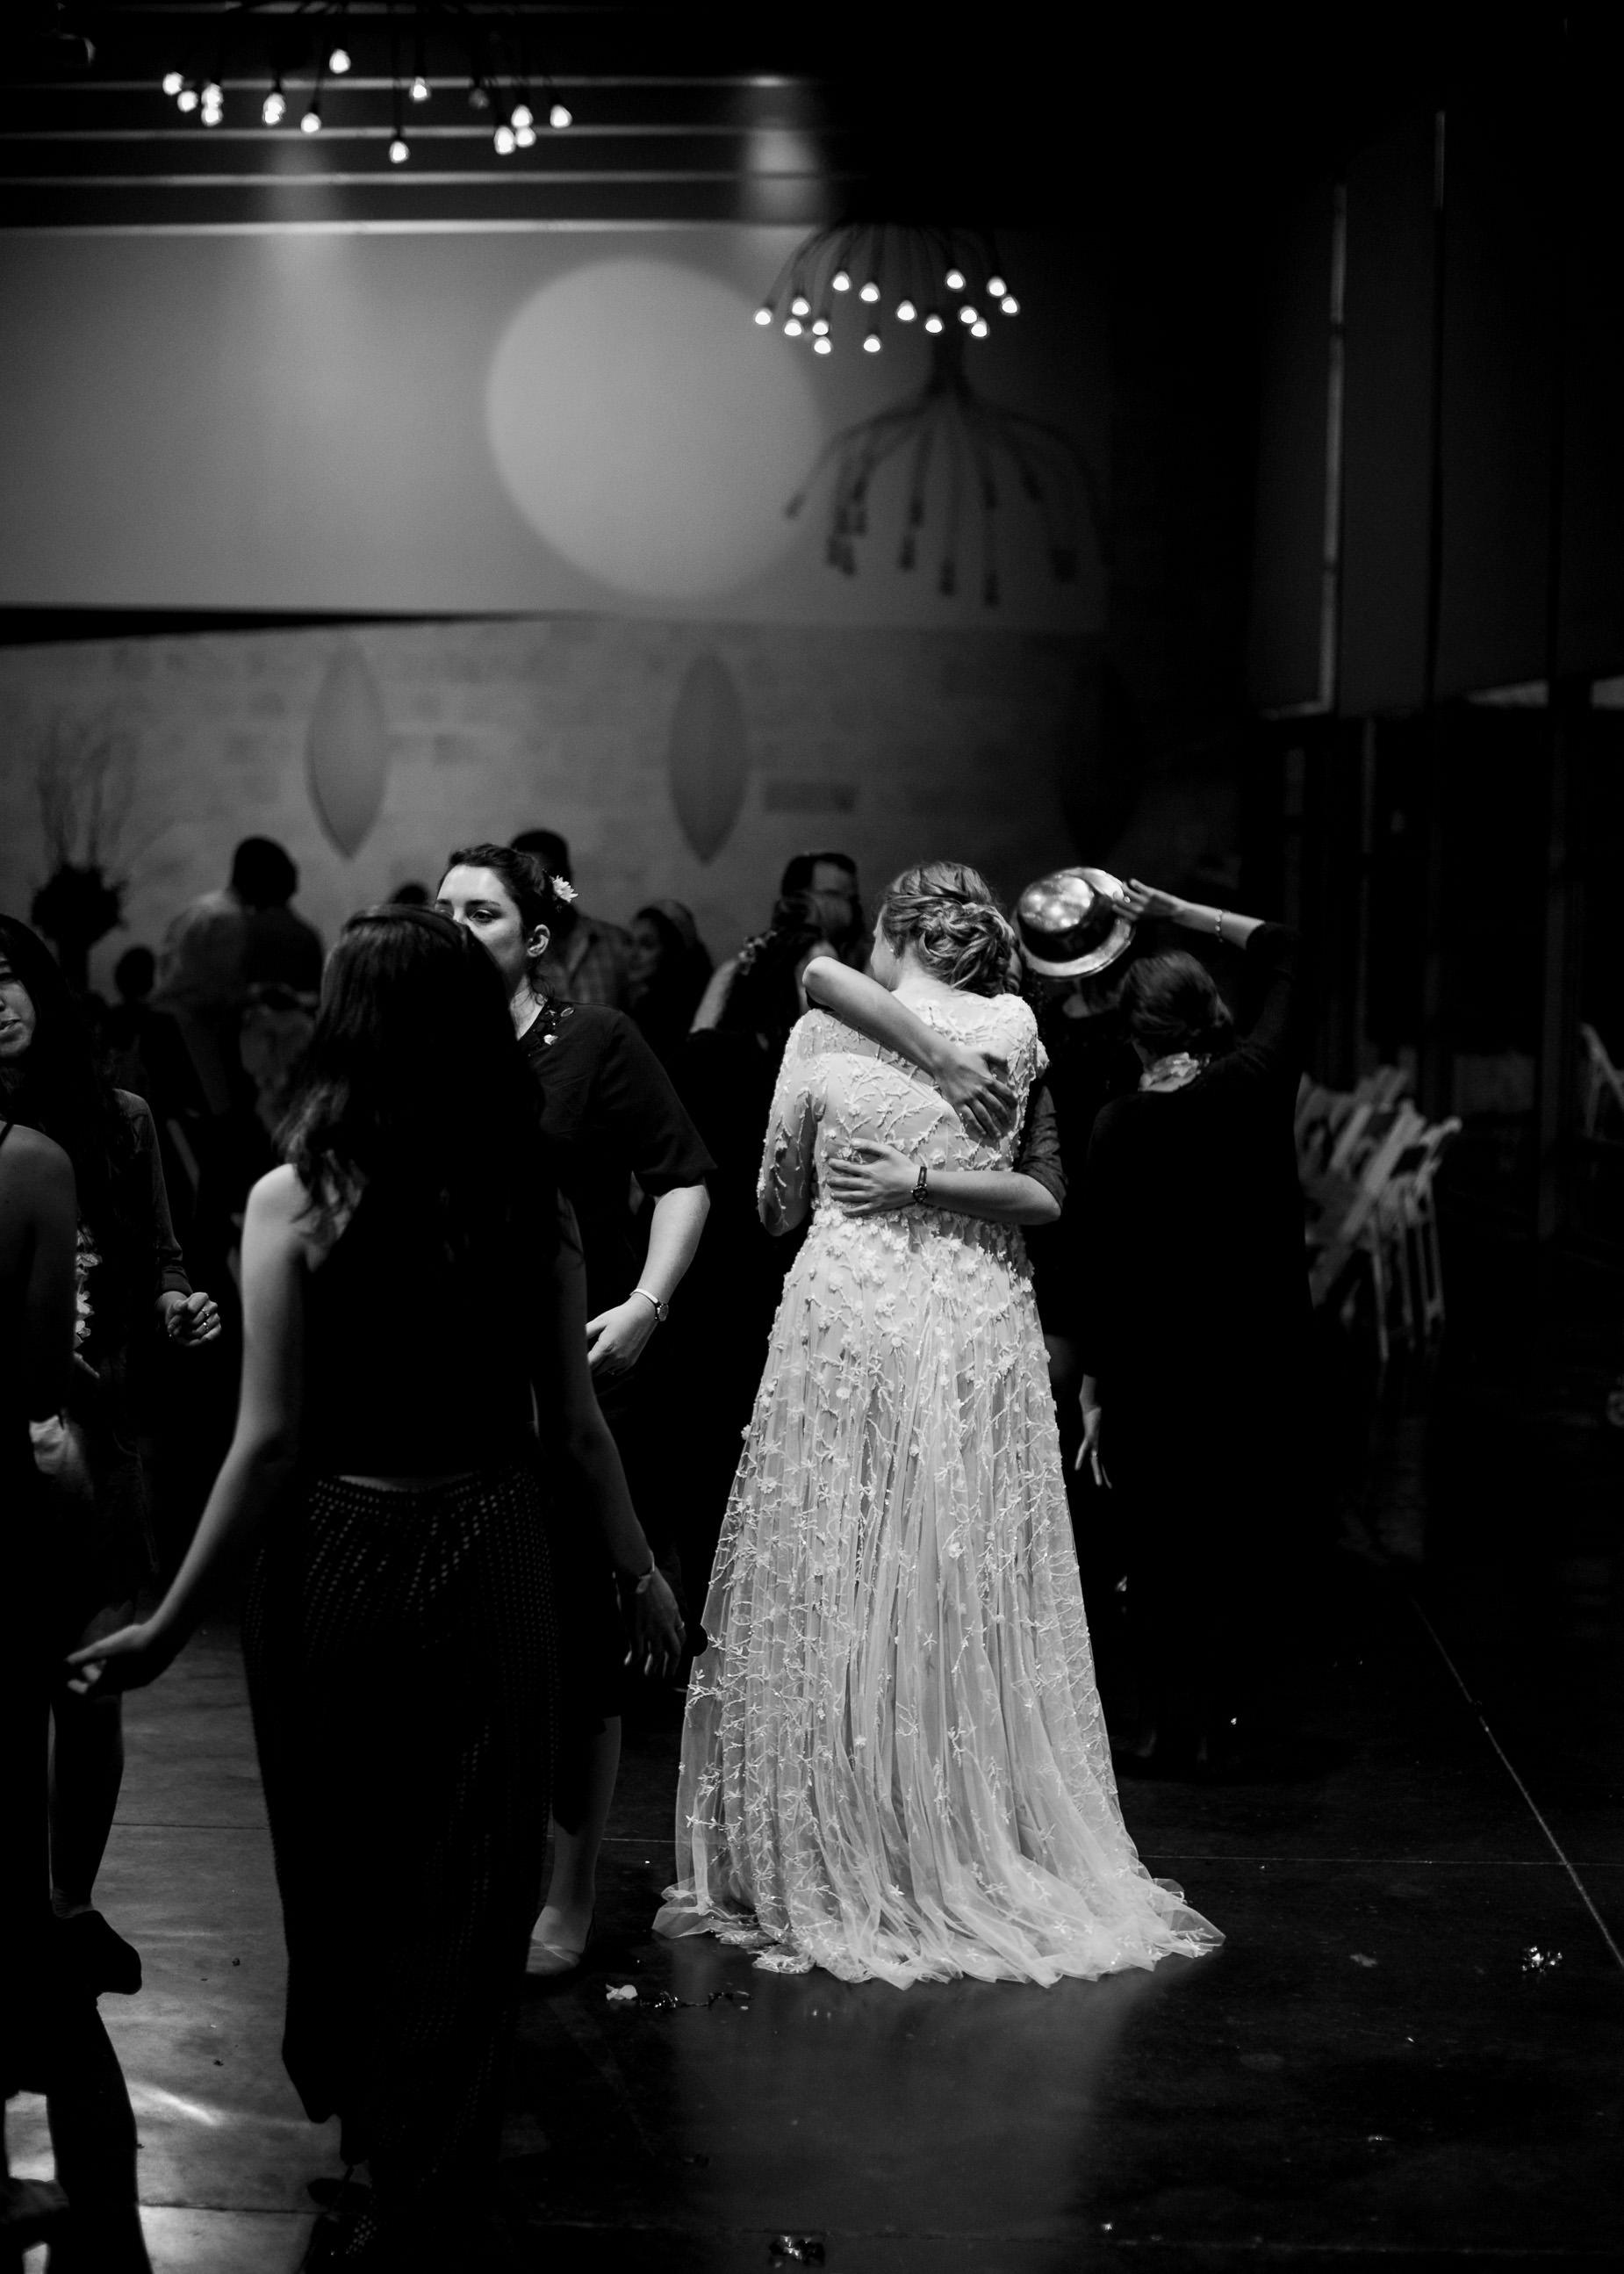 bride dancing in wedding